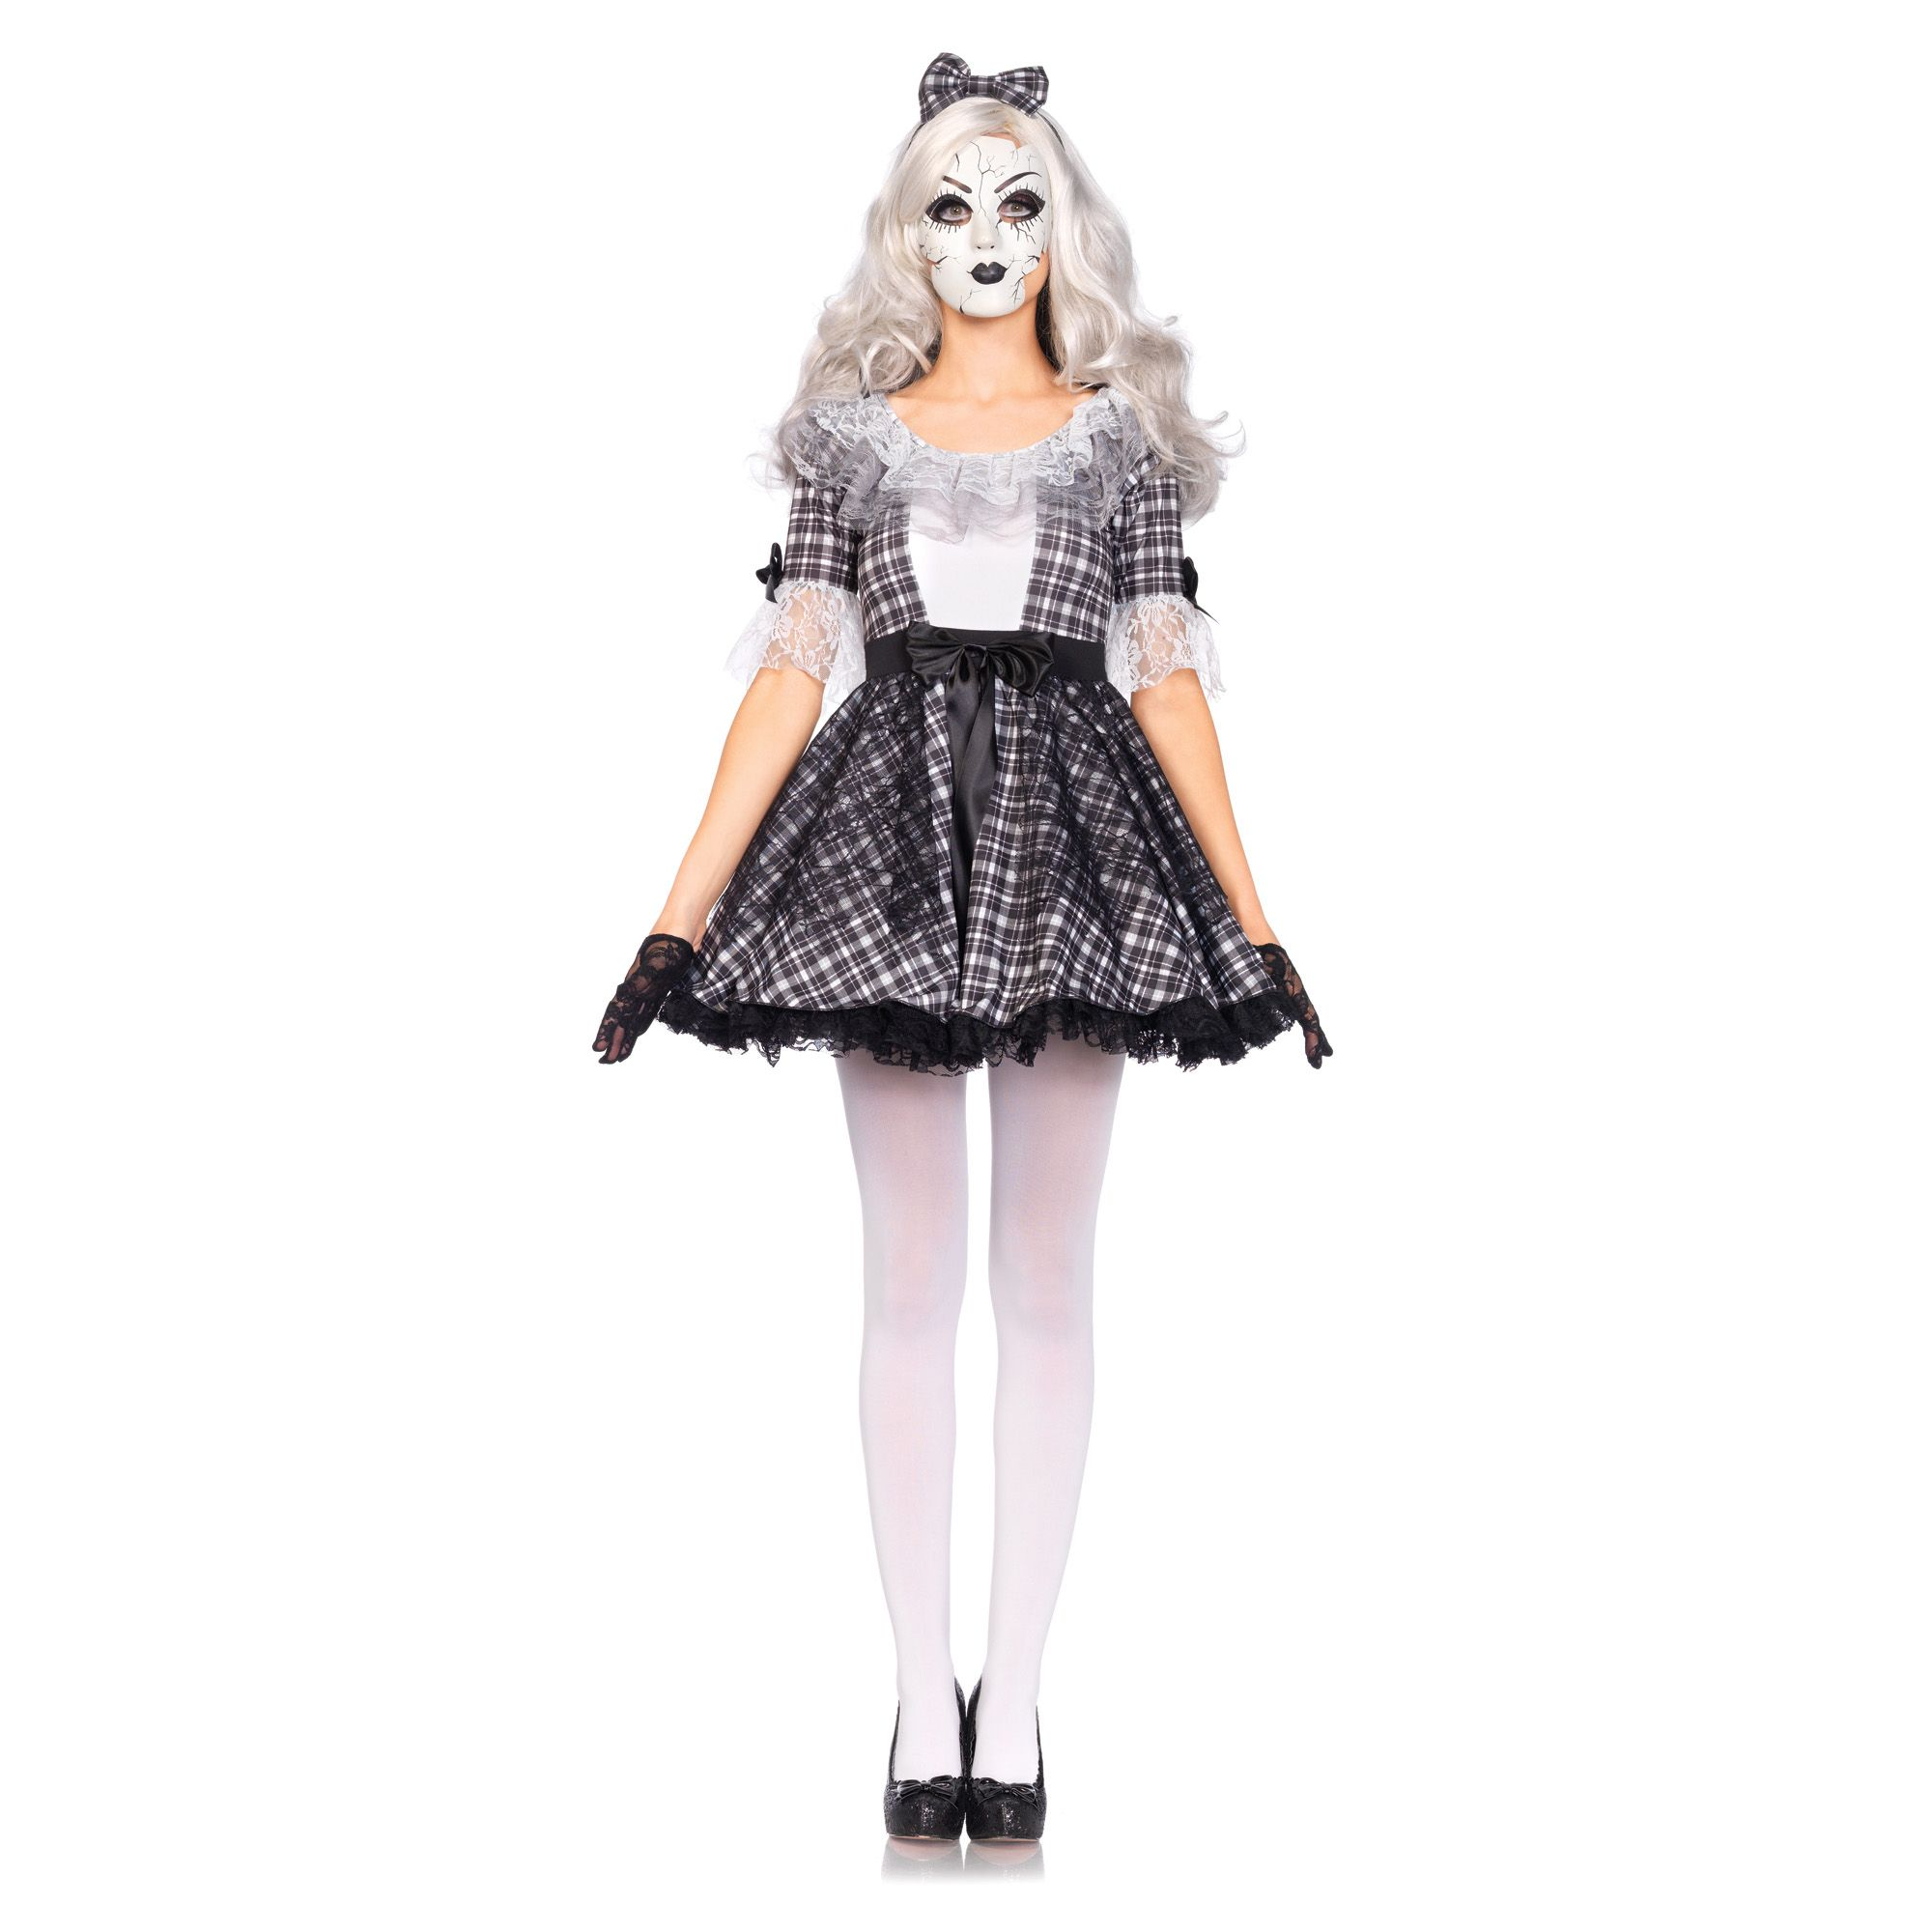 Disfraz Muñeca Pretty Porcelain Deluna Disfraces Disfraces Hallowen Chicas Halloween Disfraces Disfraces